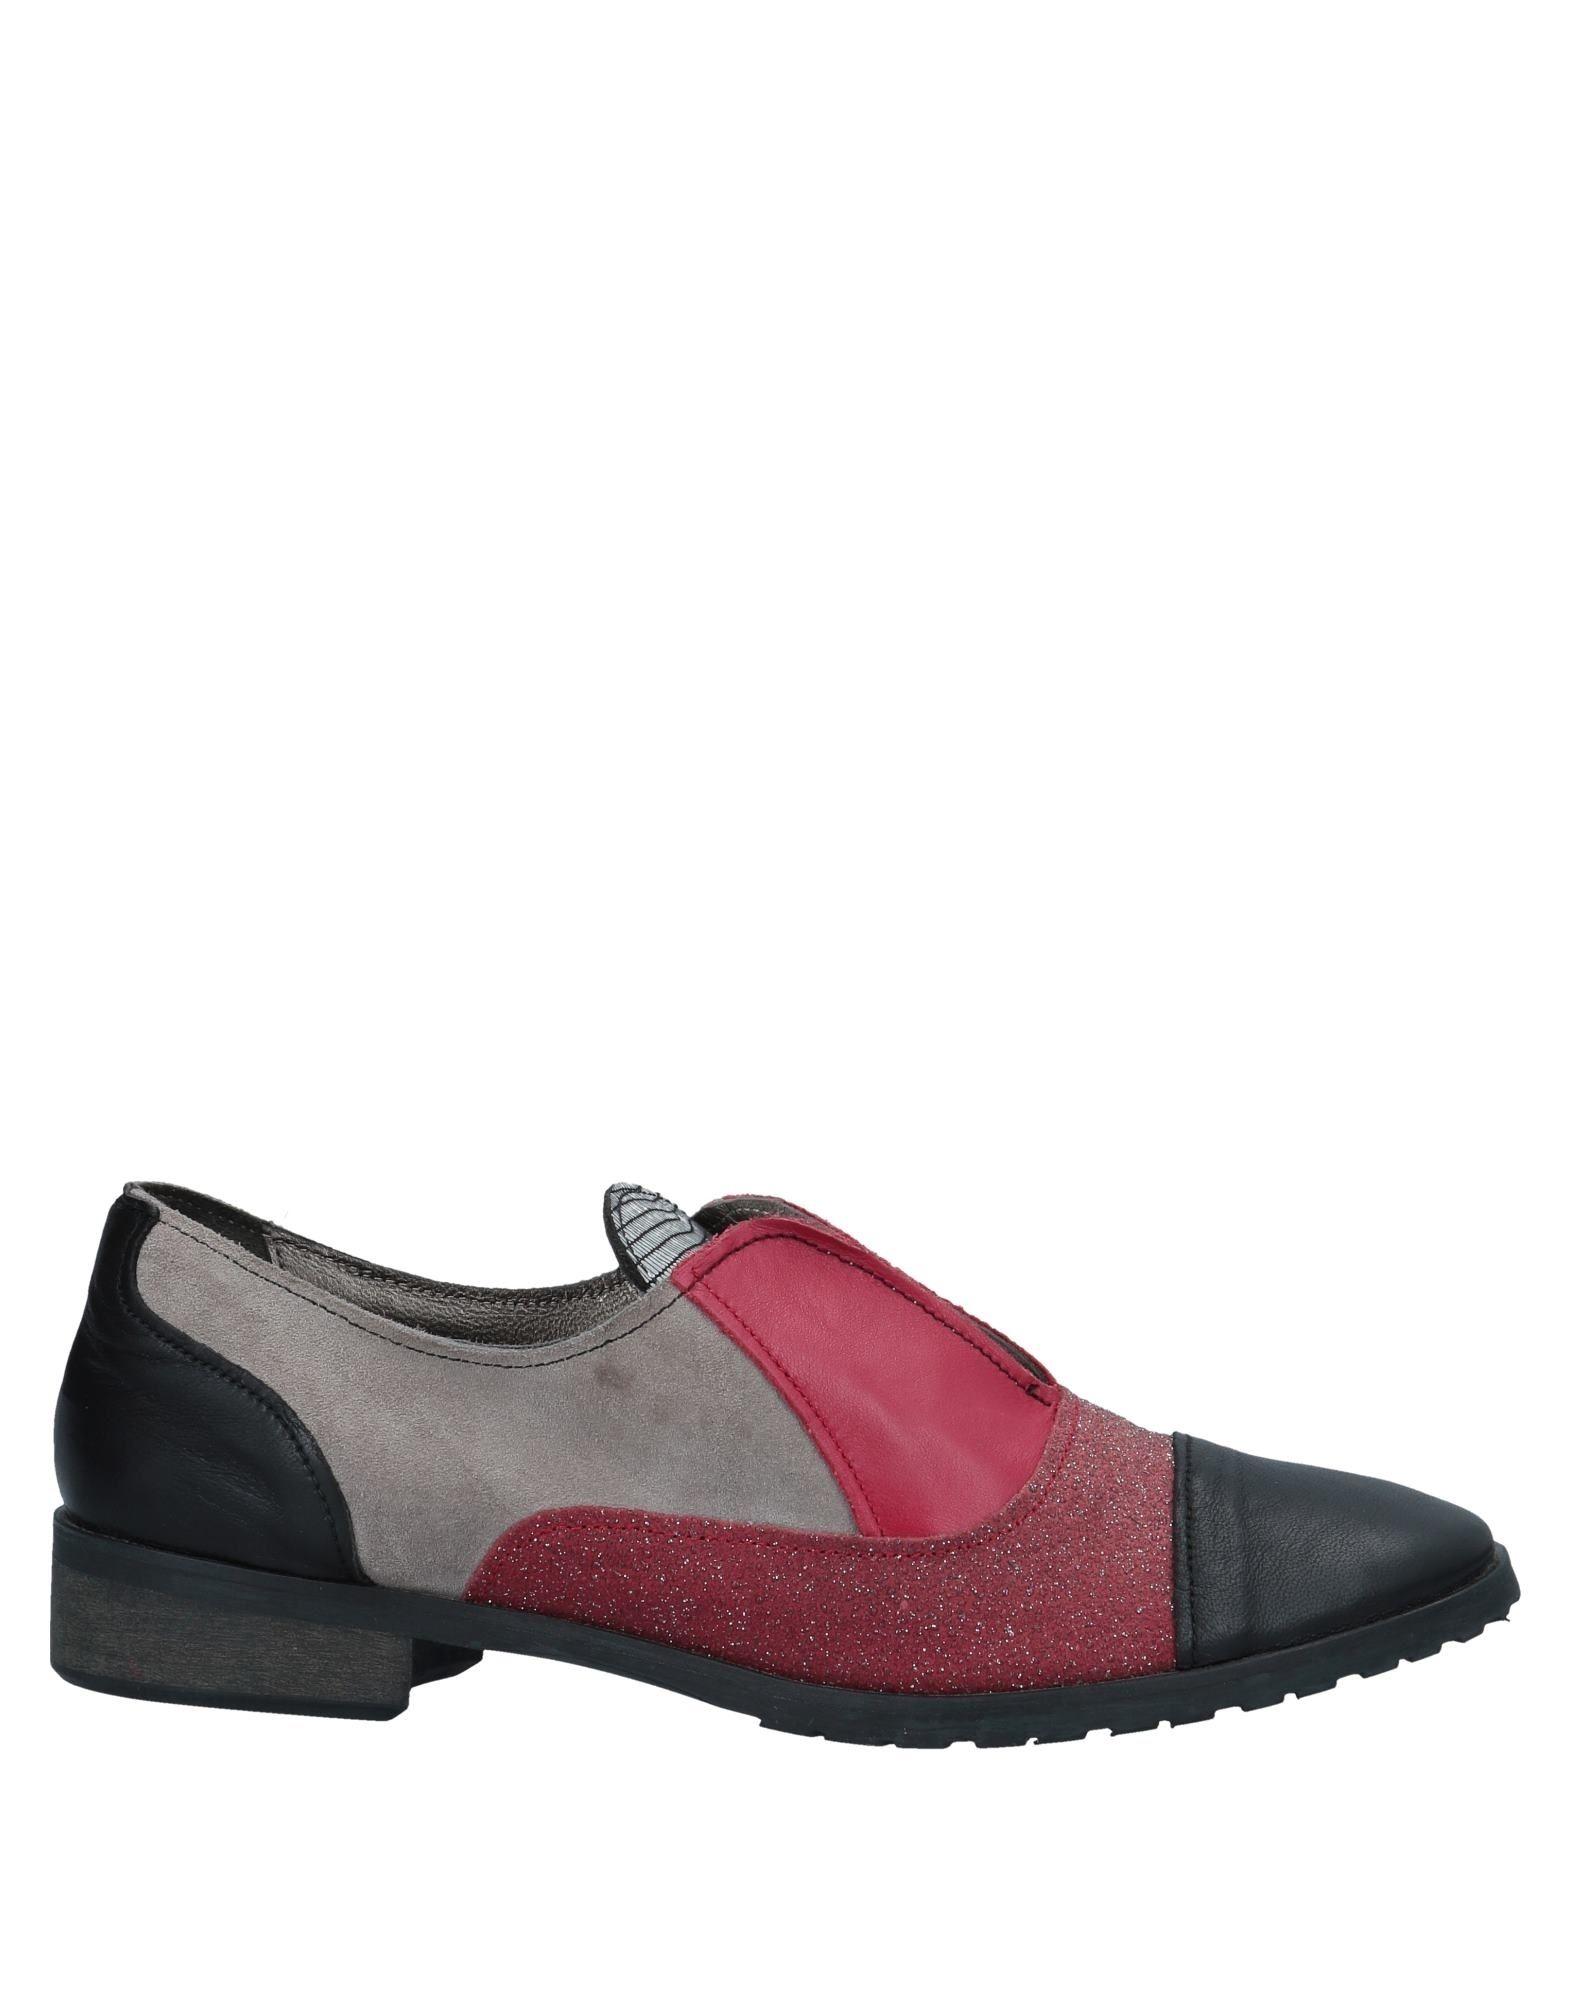 Sneakers Mizuno Donna e - 11538073RB Nuove offerte e Donna scarpe comode c7de6a